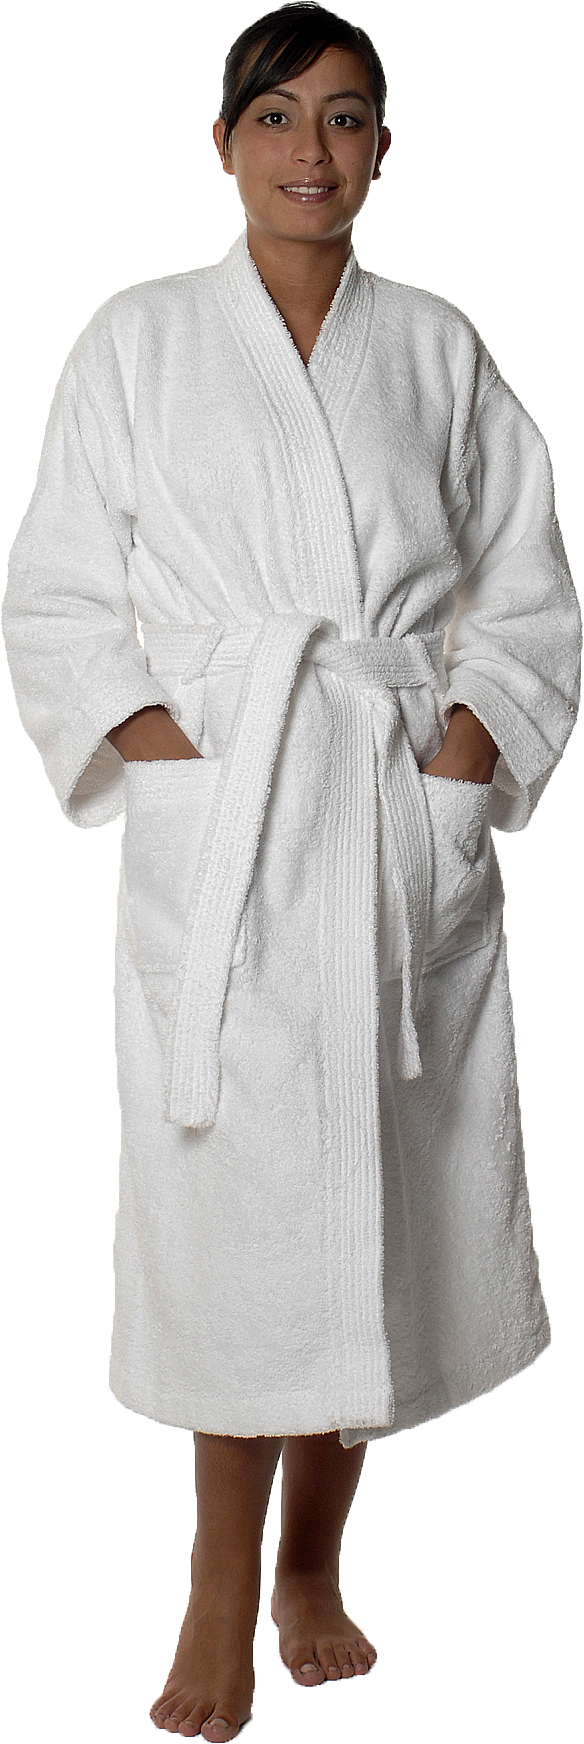 Peignoir col kimono en Coton couleur Blanc Taille M (Blanc)